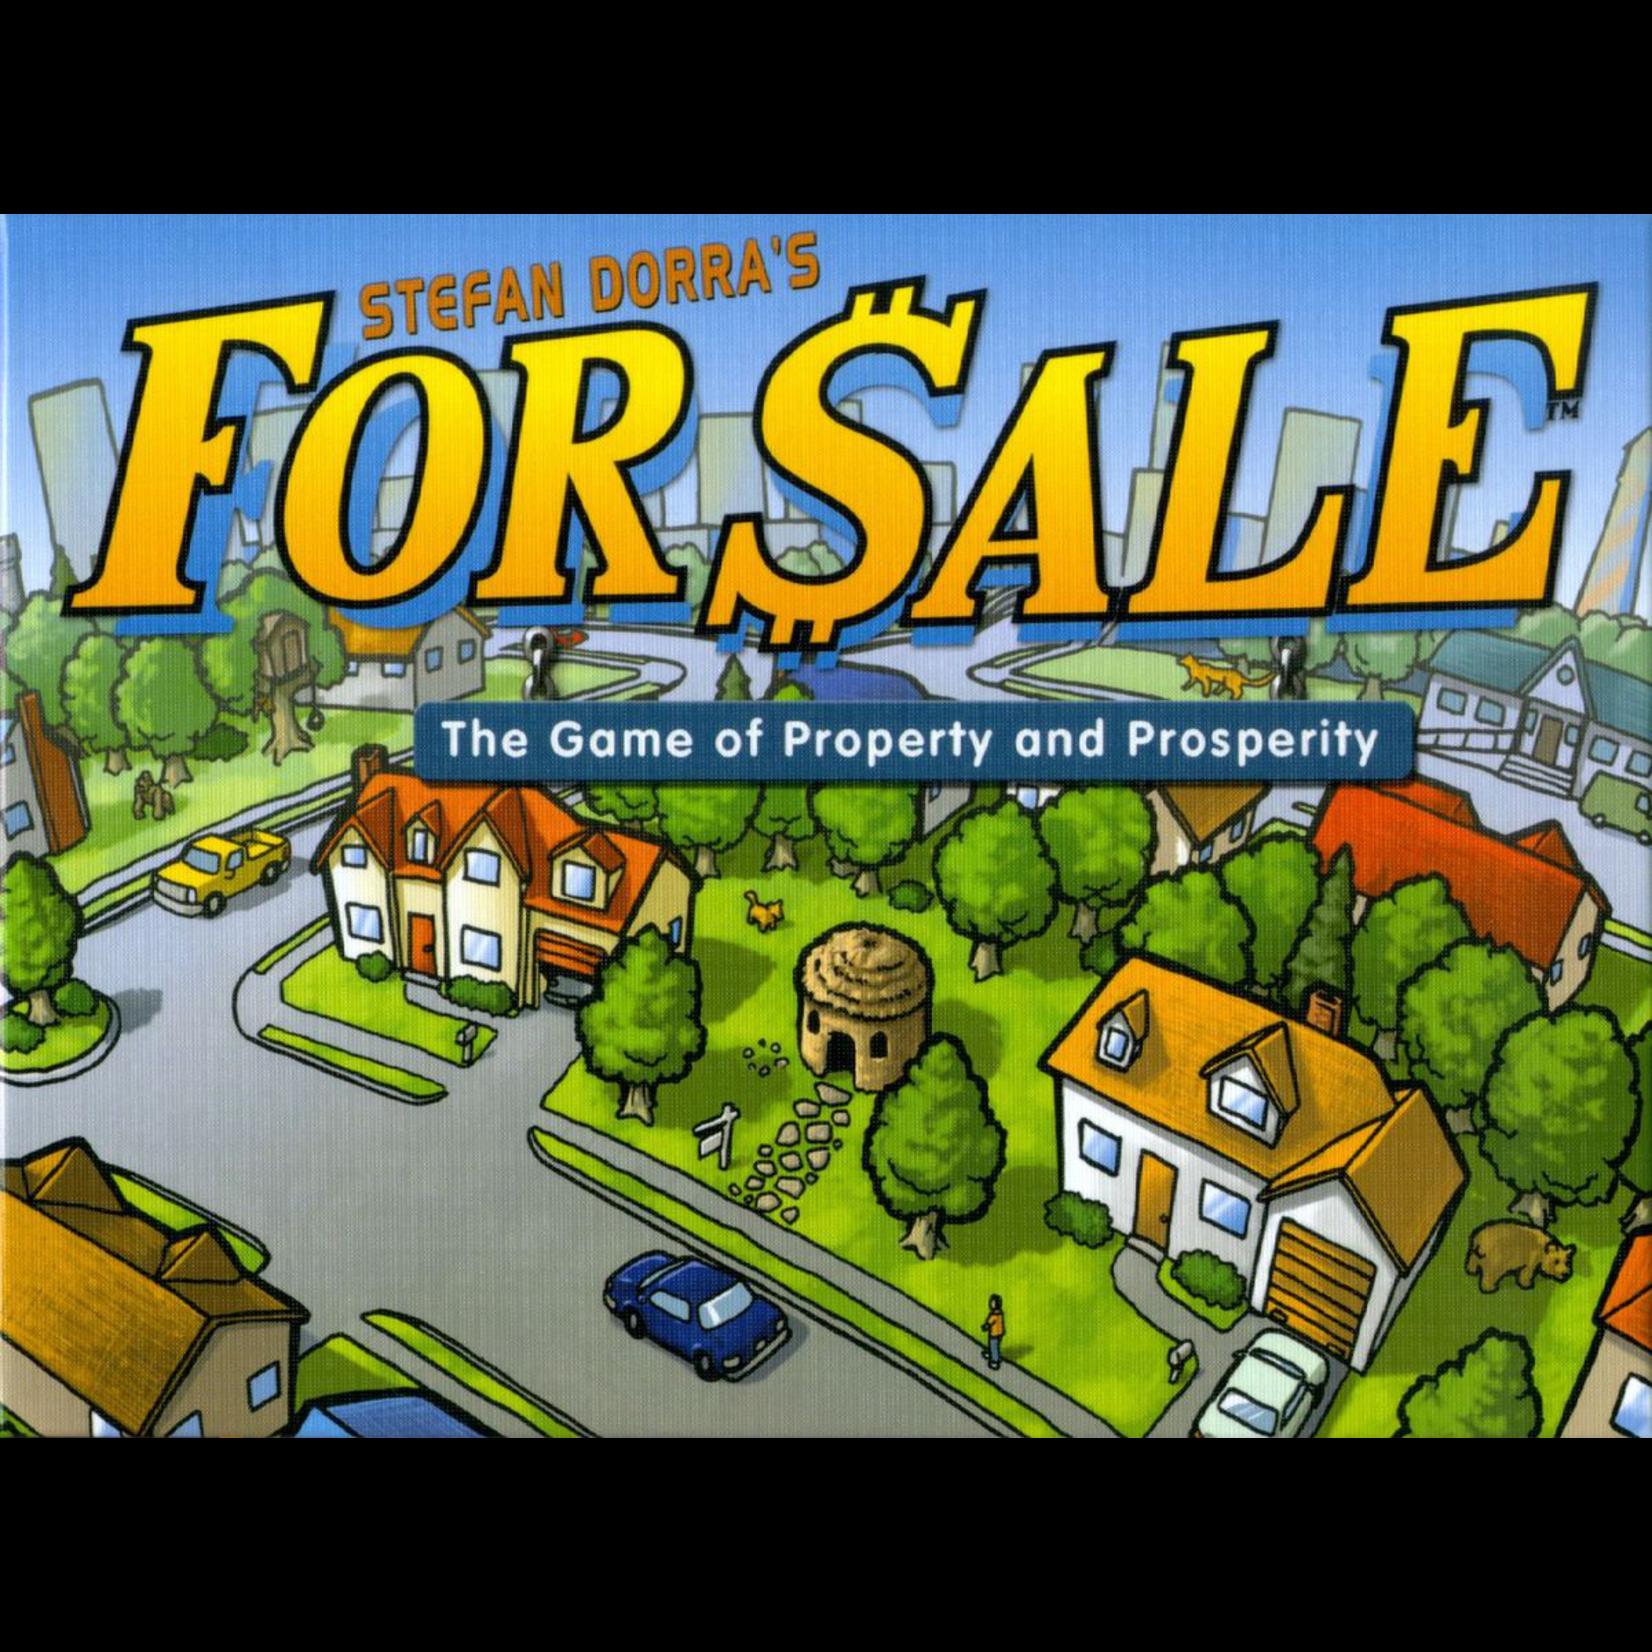 Eagle-Gryphon For Sale